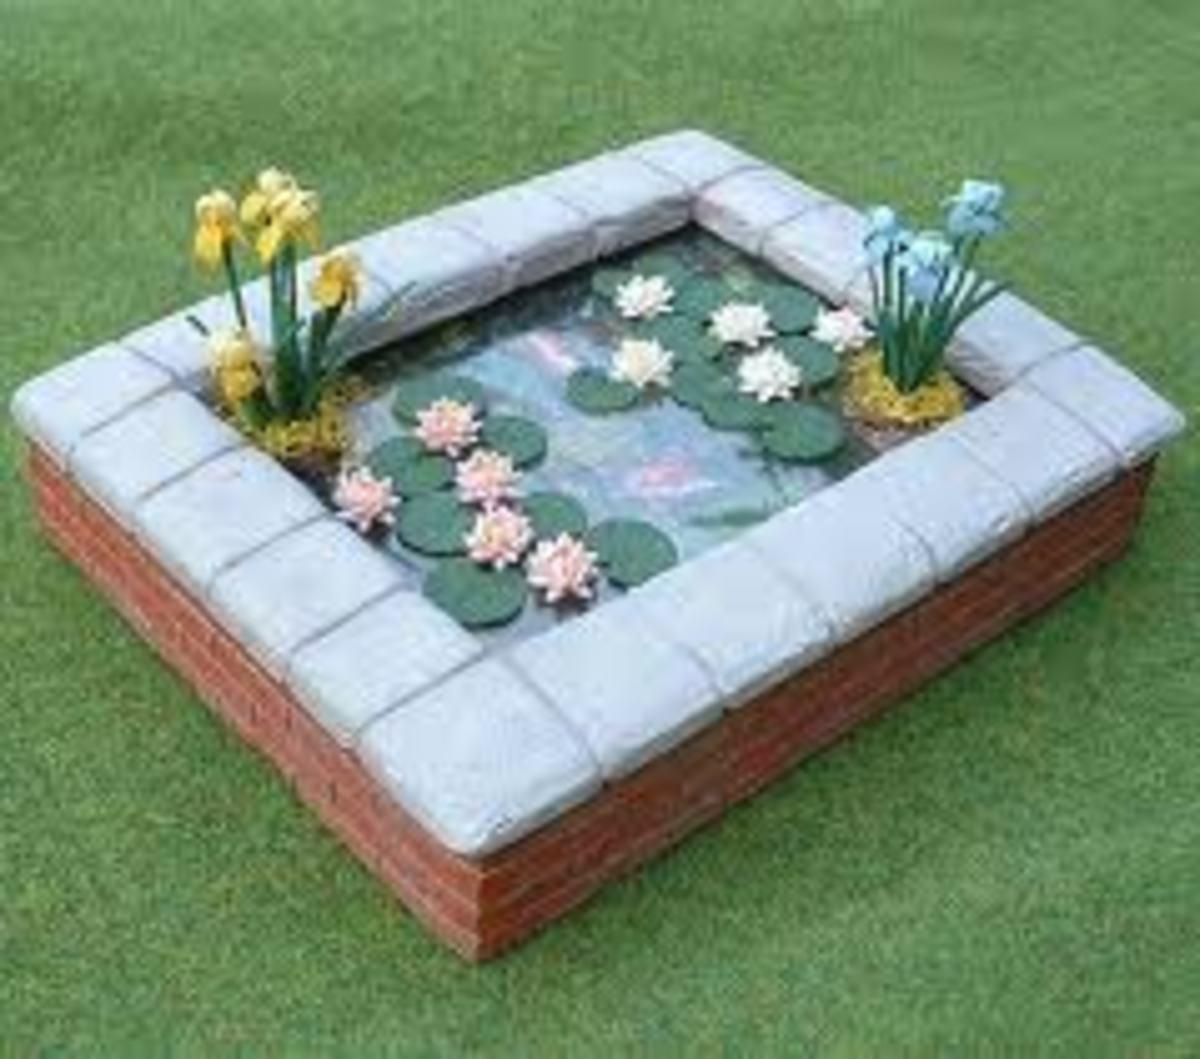 Fish pond made from a sandbox